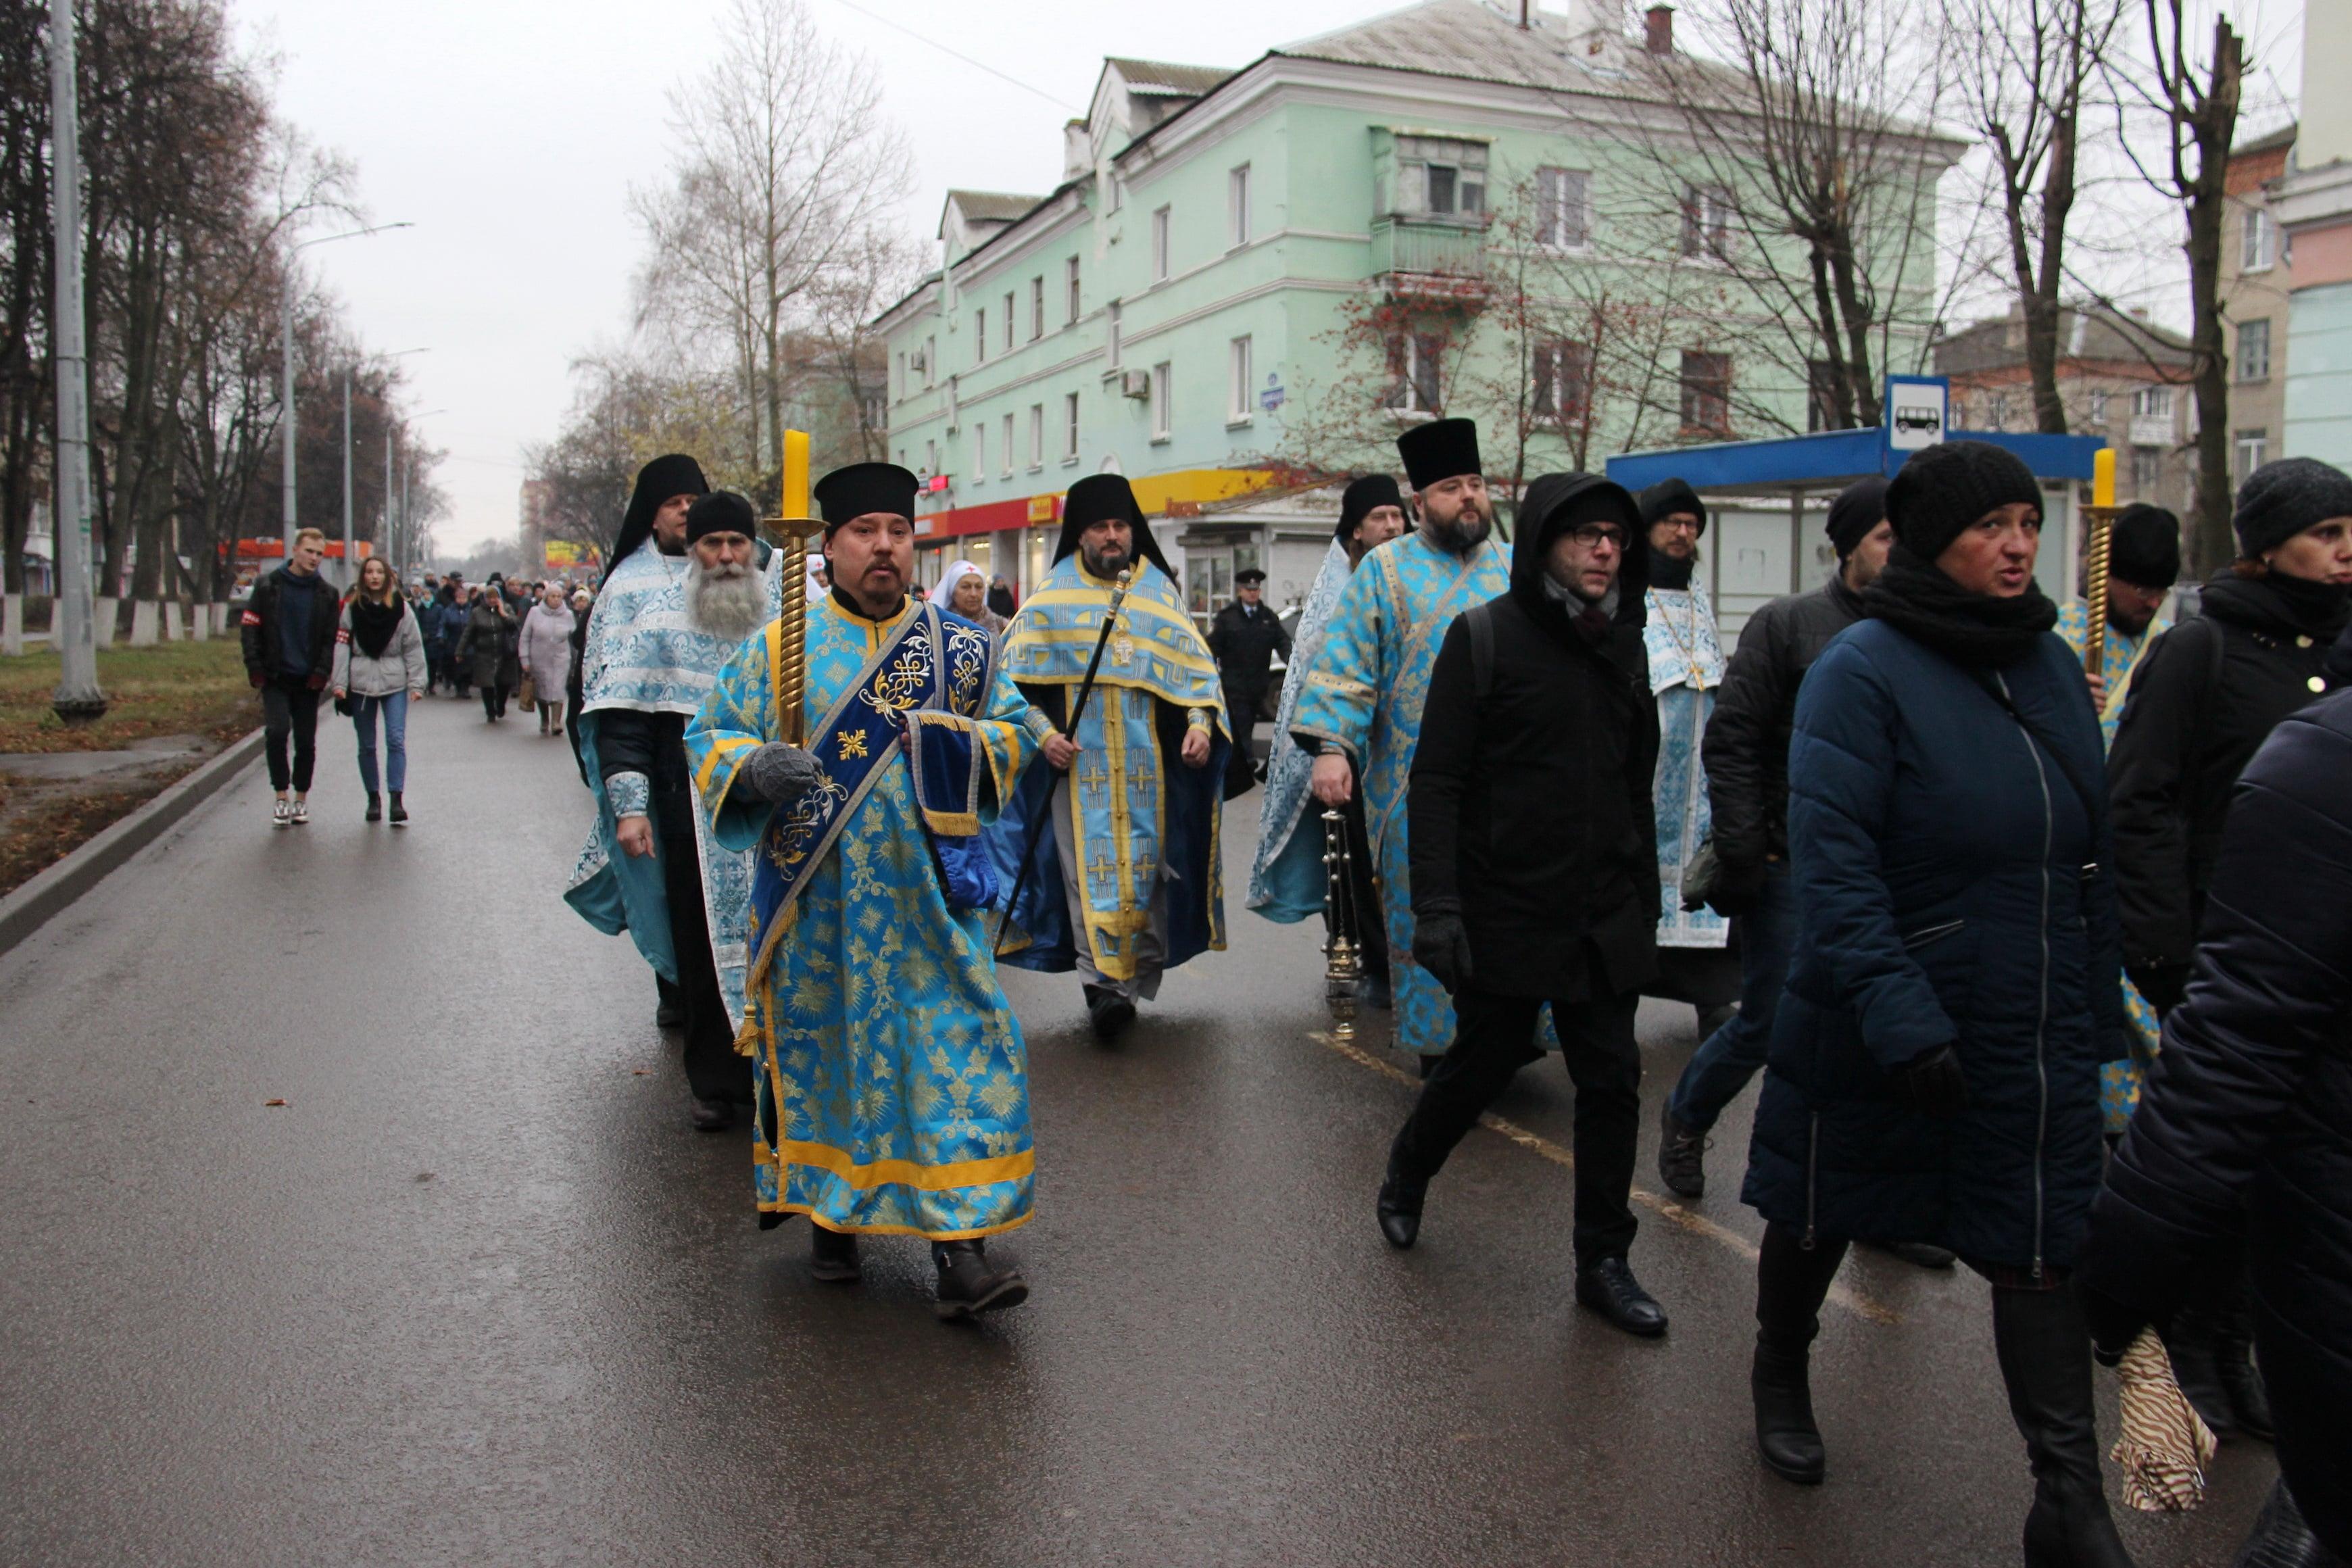 http://monuspen.ru/photoreports/e885ad143ffeae12541ceee7e7725b1u.JPG